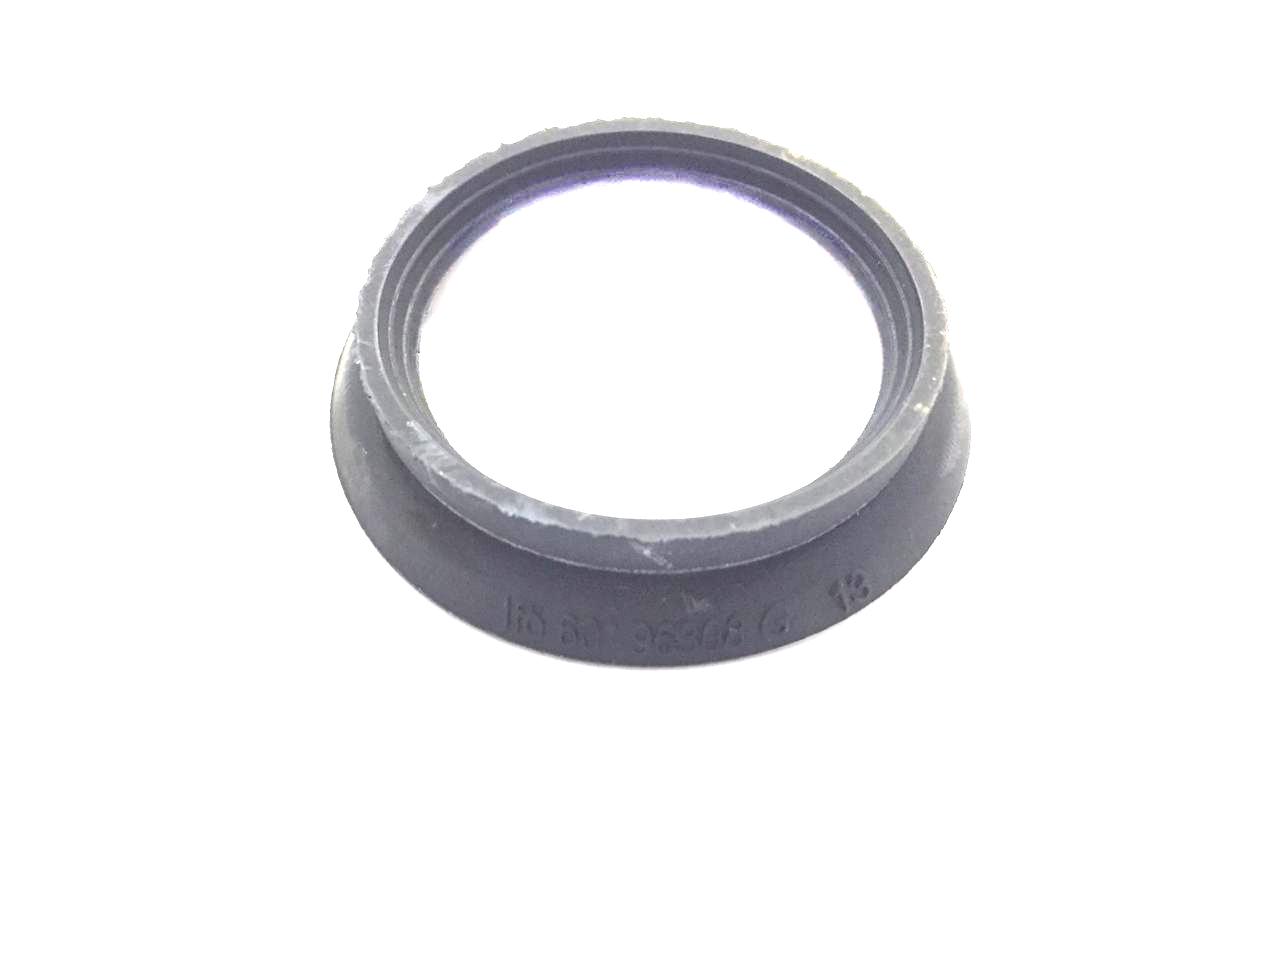 Оригинальное запорное кольцо клапана слива унитаза IFO